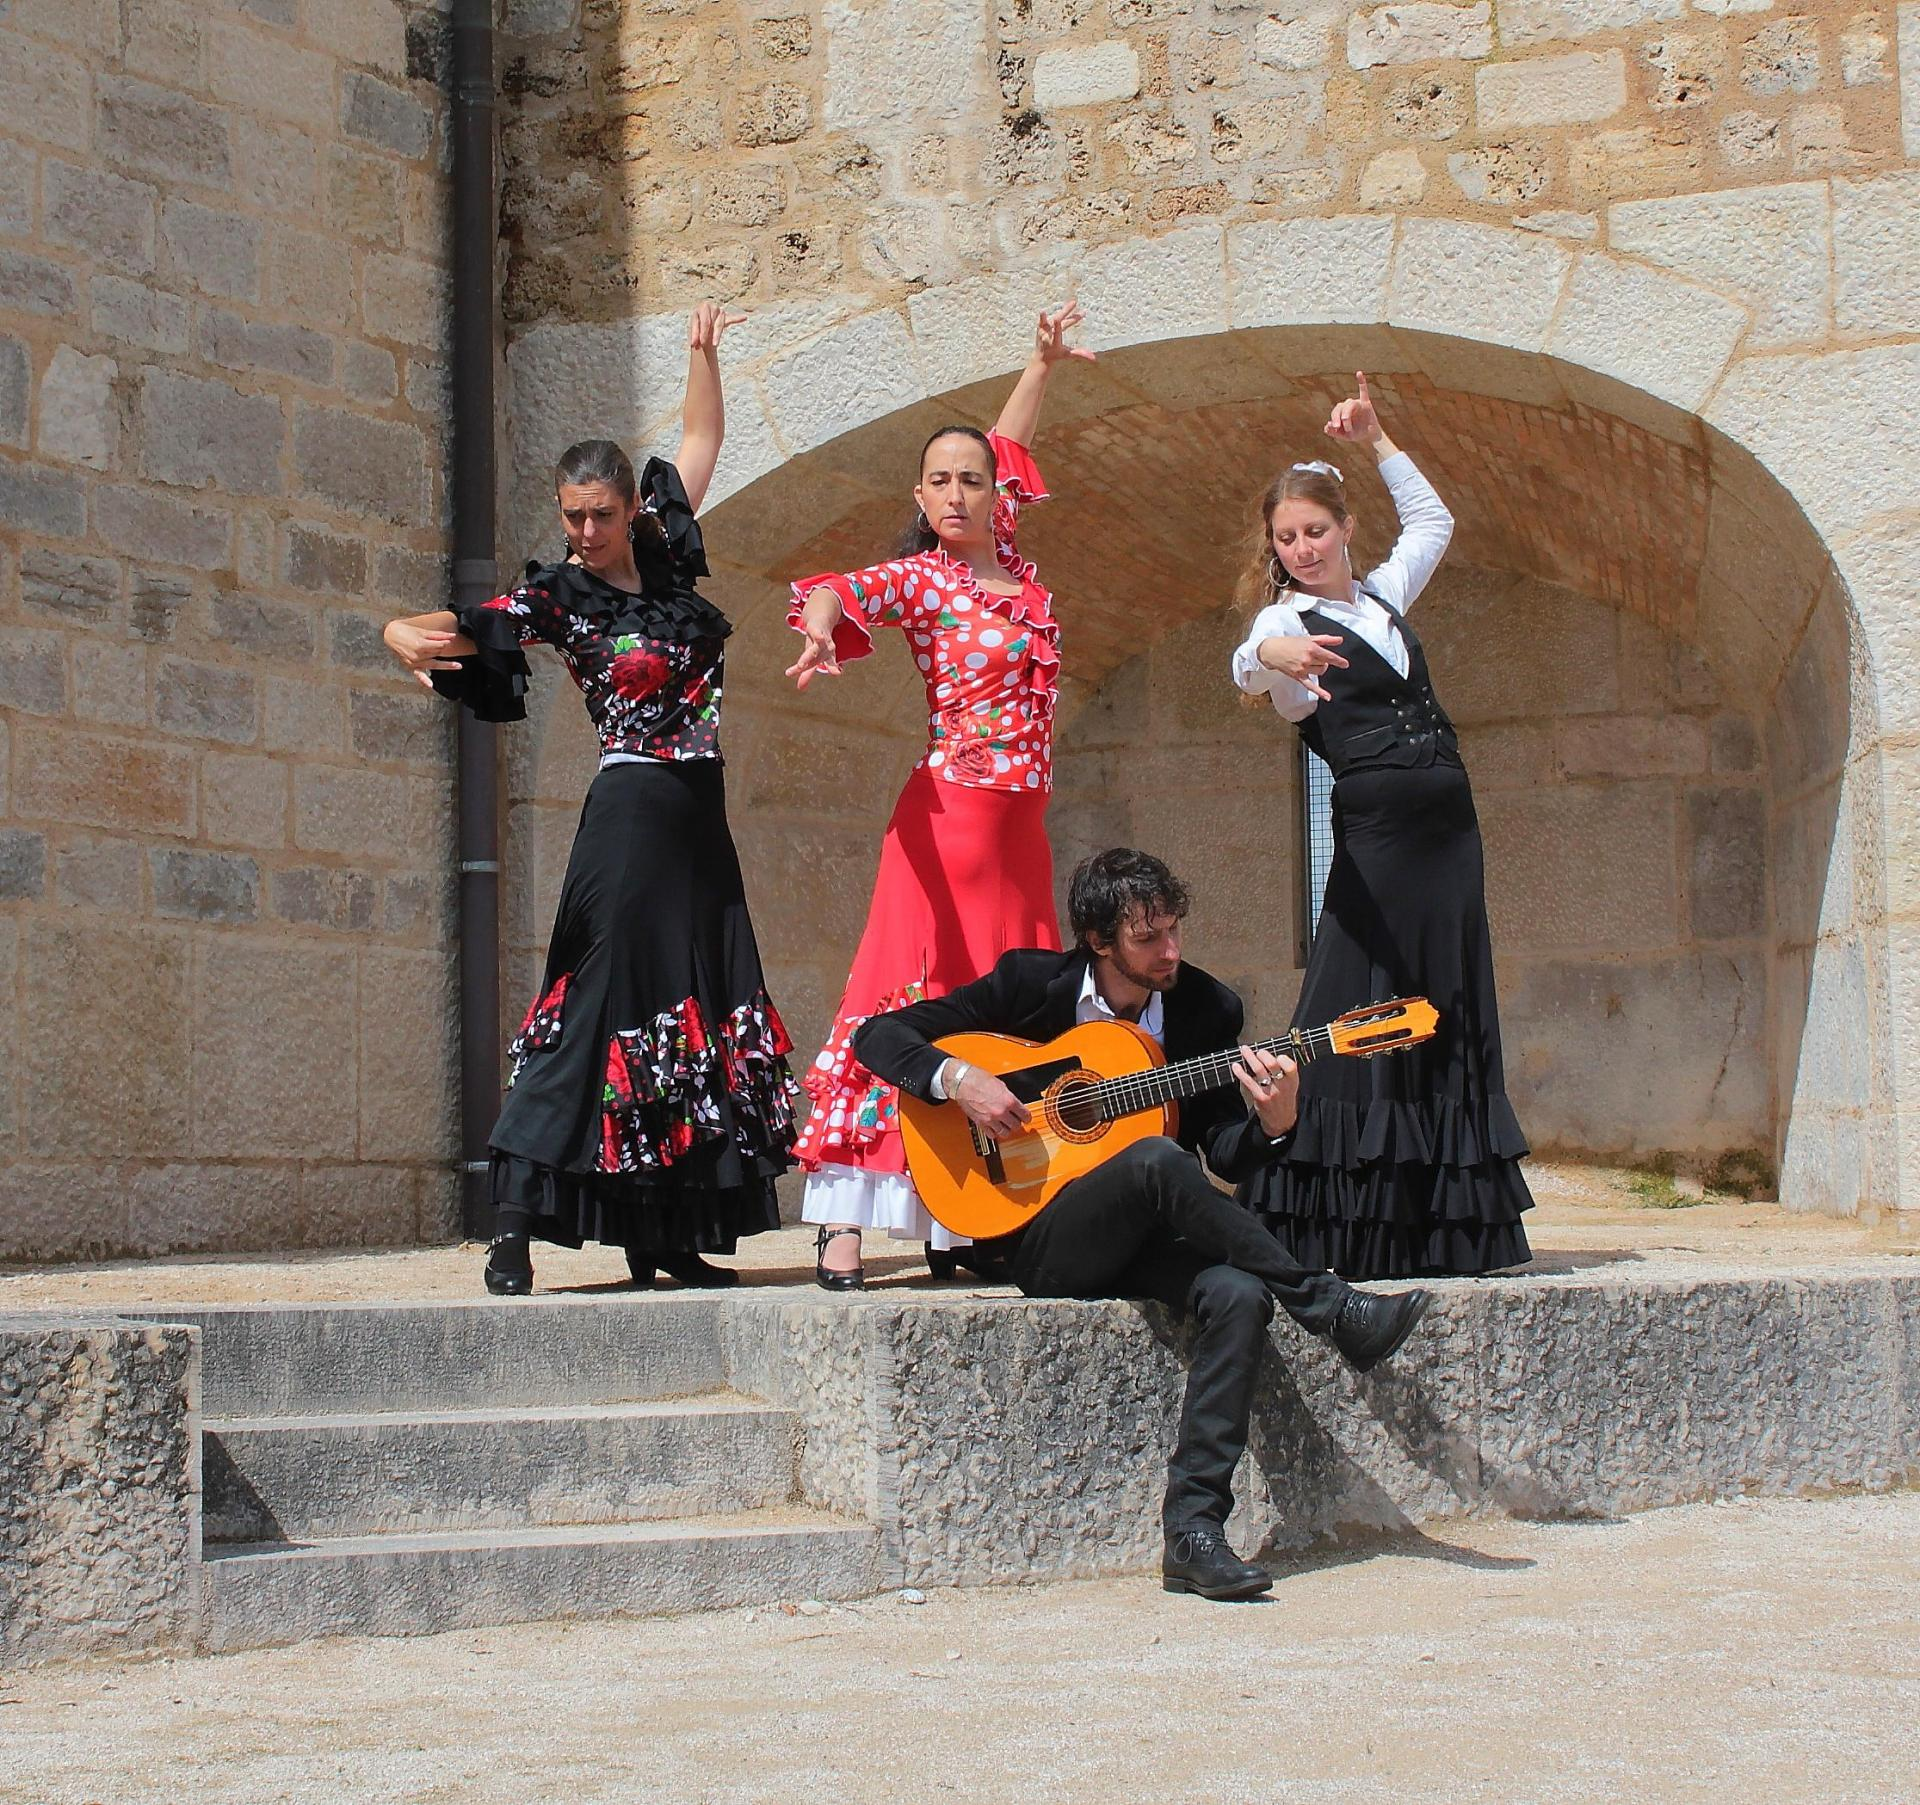 L invitation au voyage duende flamenco citadelle besancon 210821